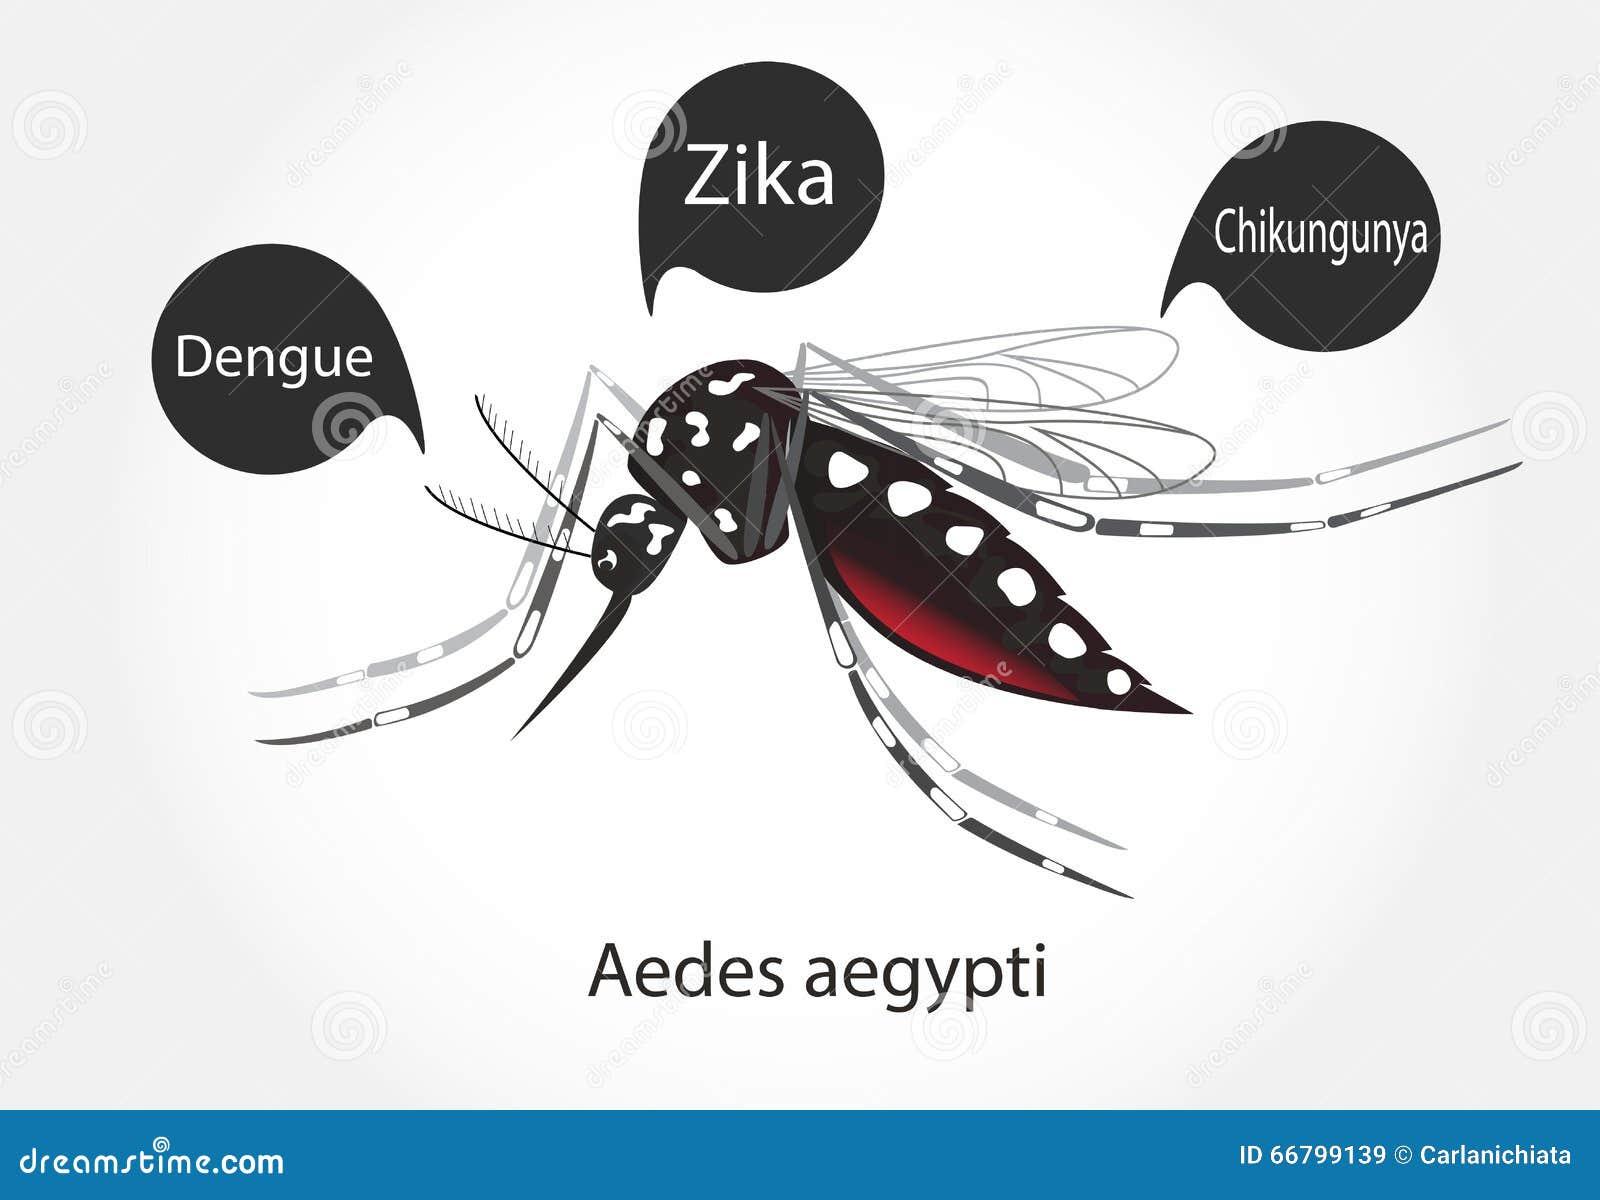 Aedes aegypti mosquito vector. Dengue Zica Chikungunya.